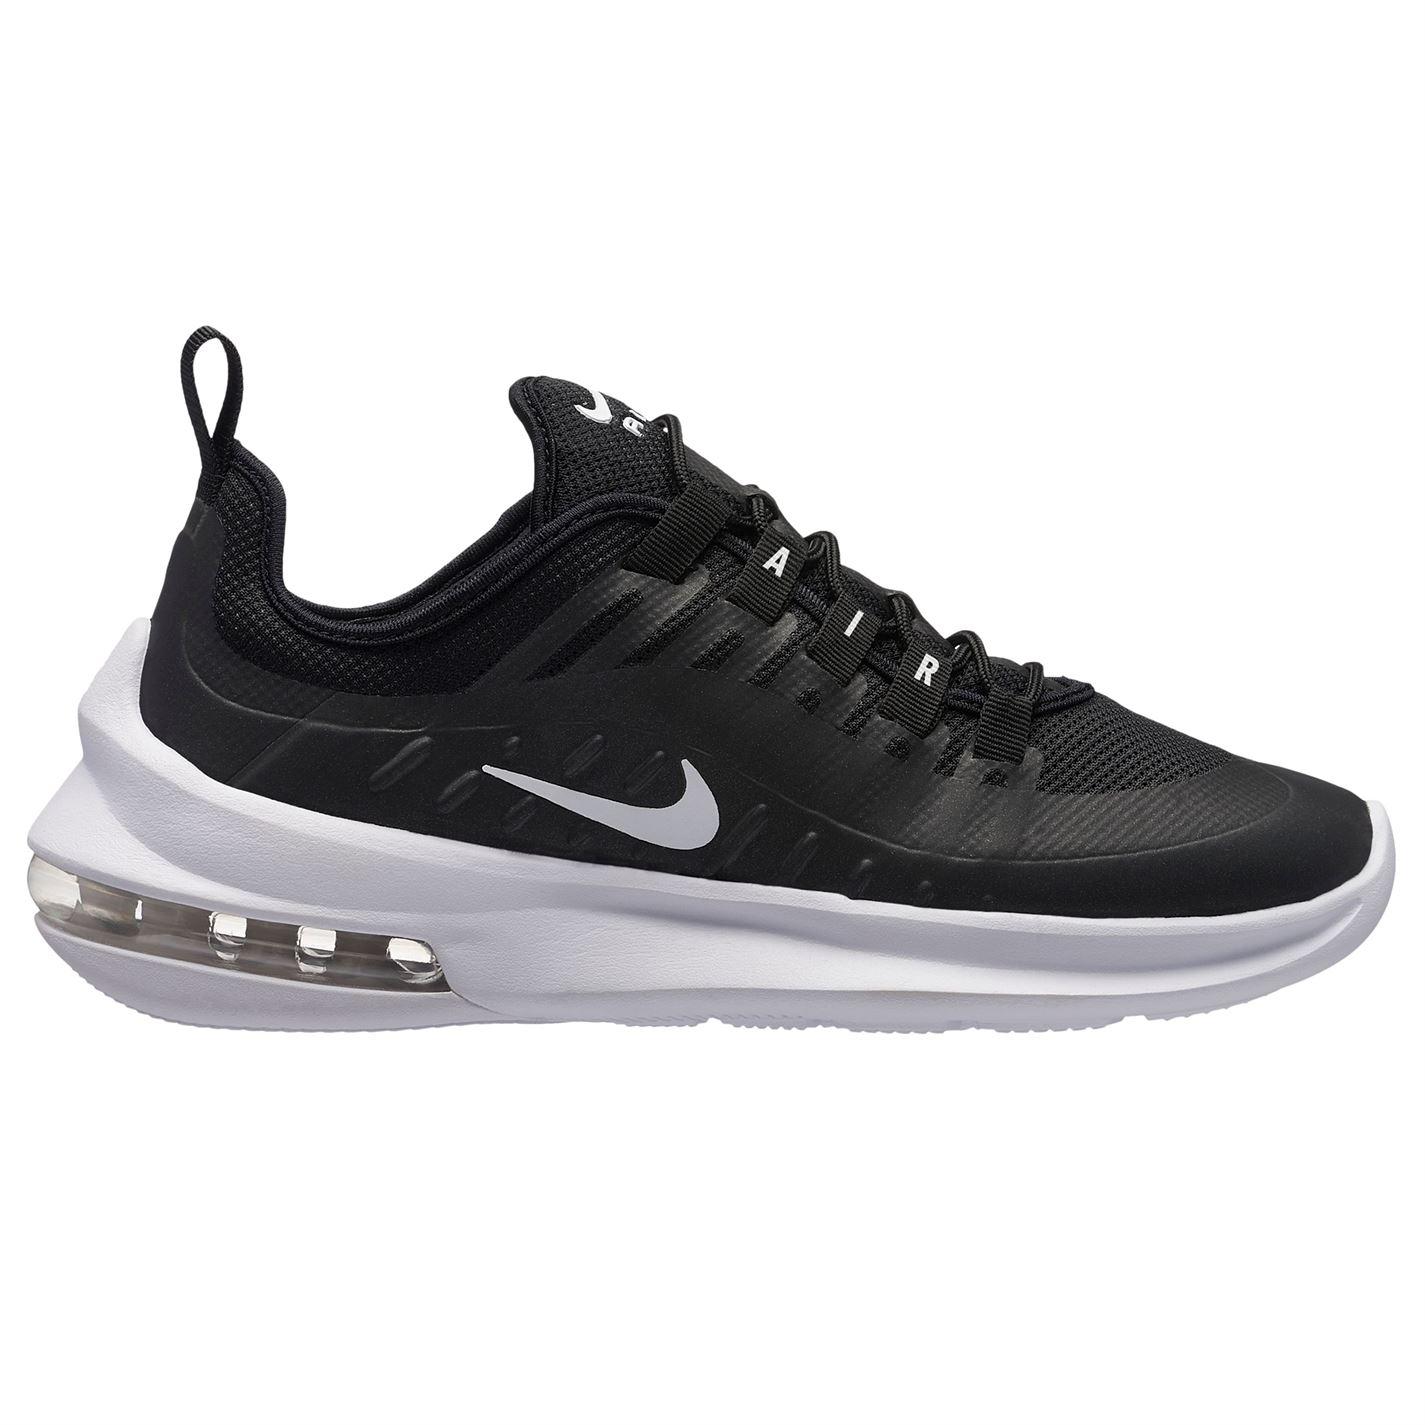 Nike Air Max Axis dámske tenisky